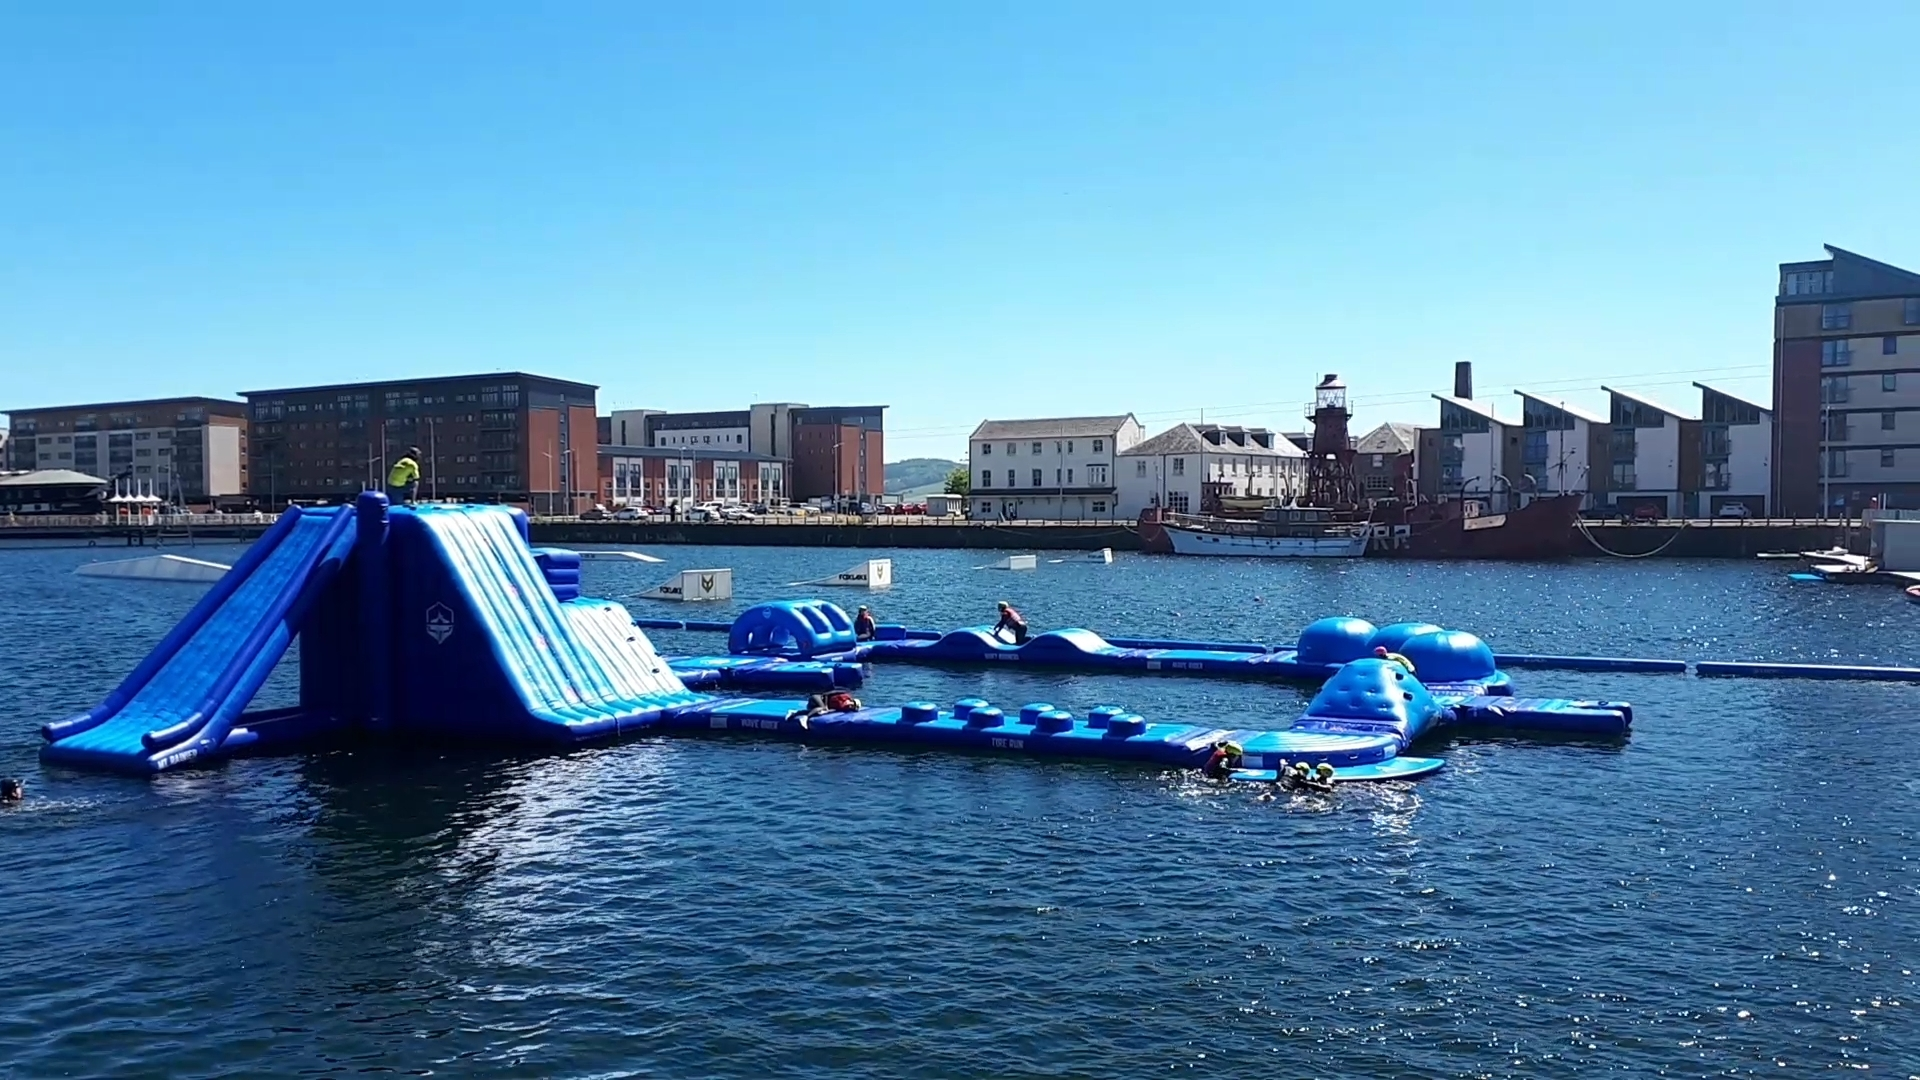 The new aqua park opened on Saturday morning at City Quay